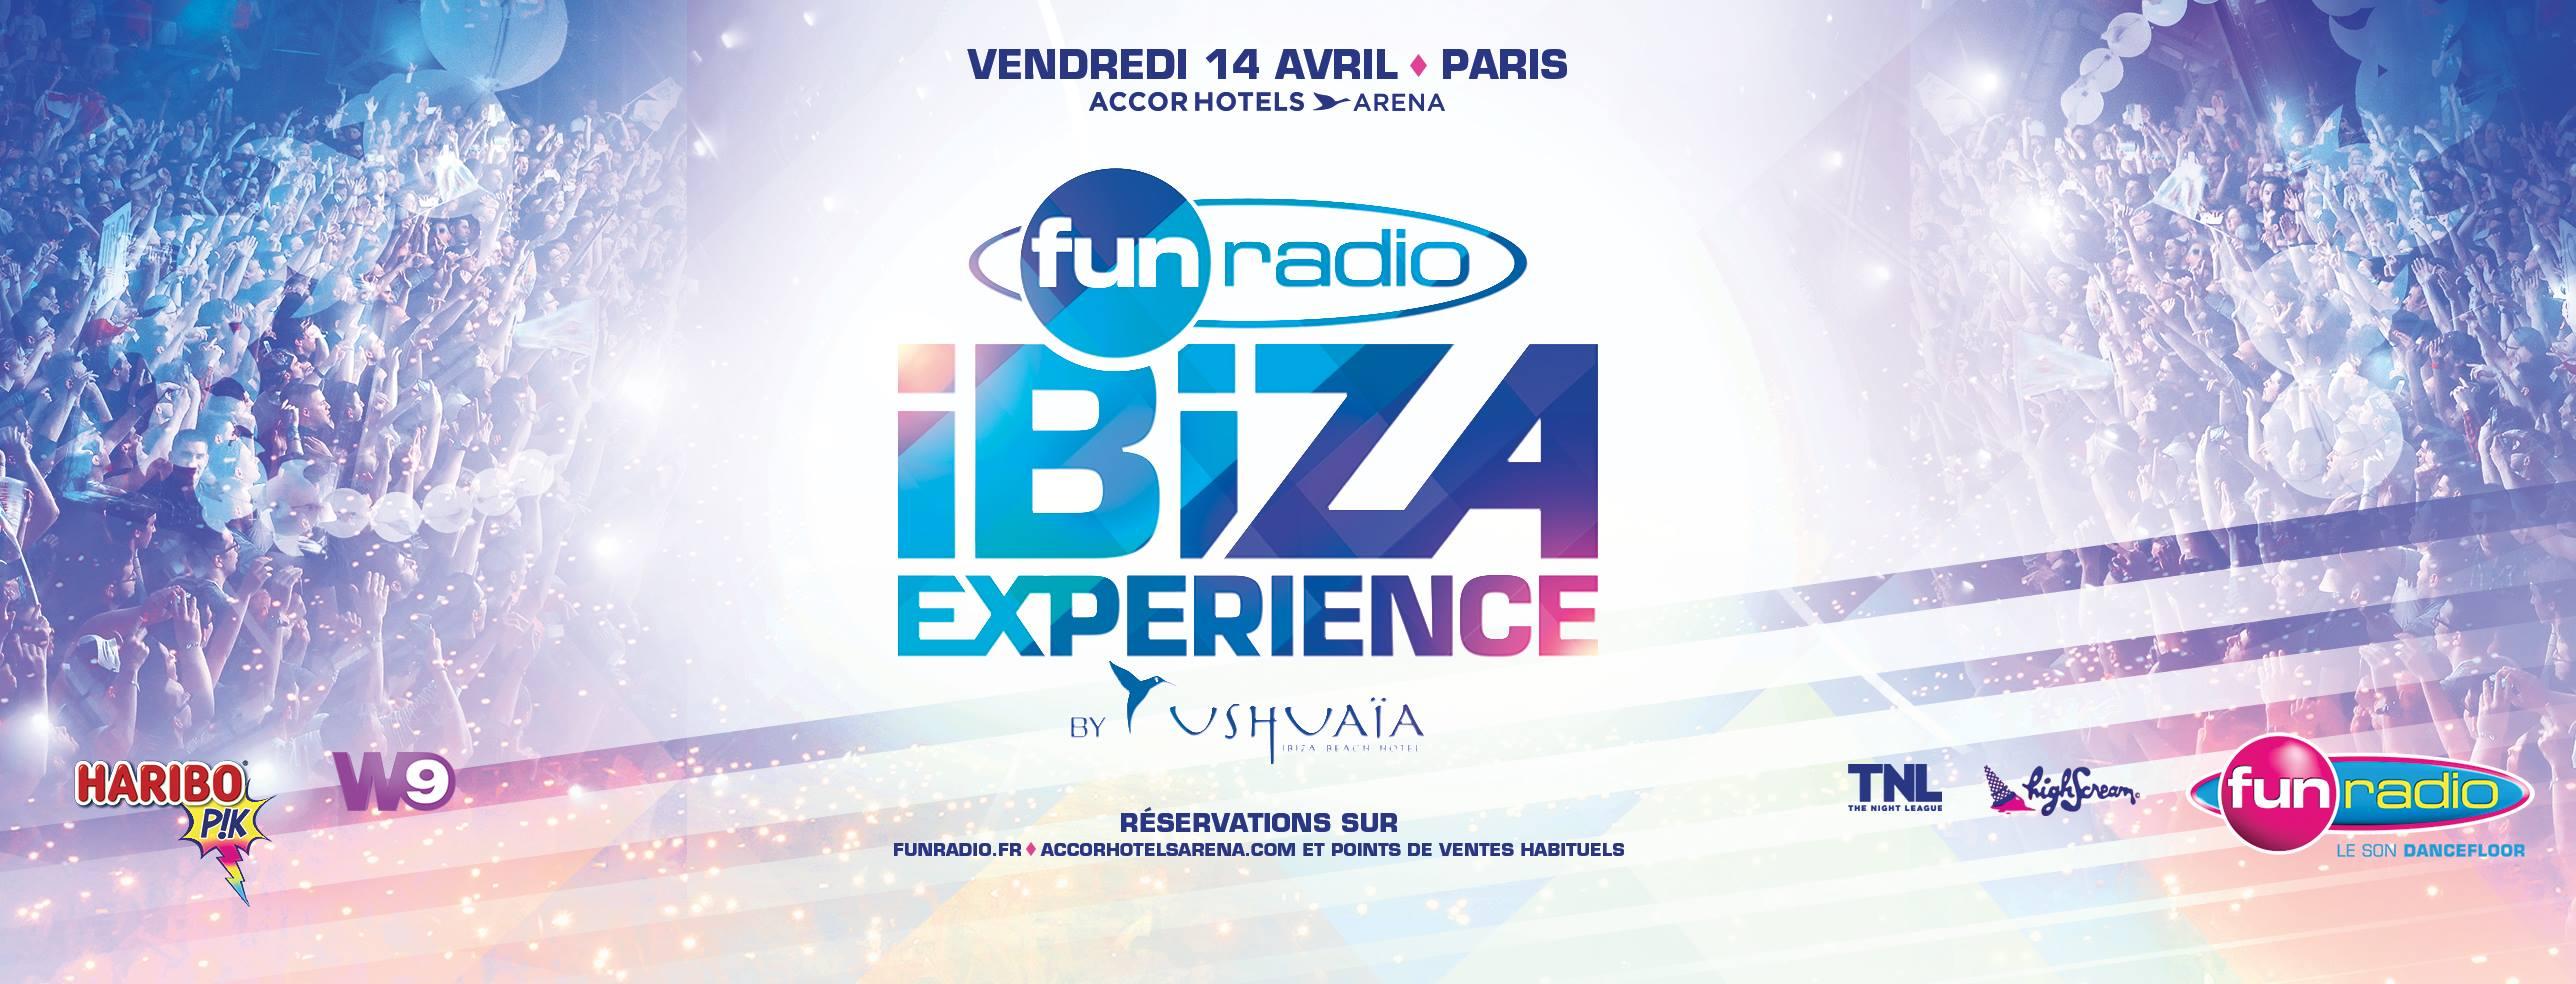 funradioibizaexperience_banner